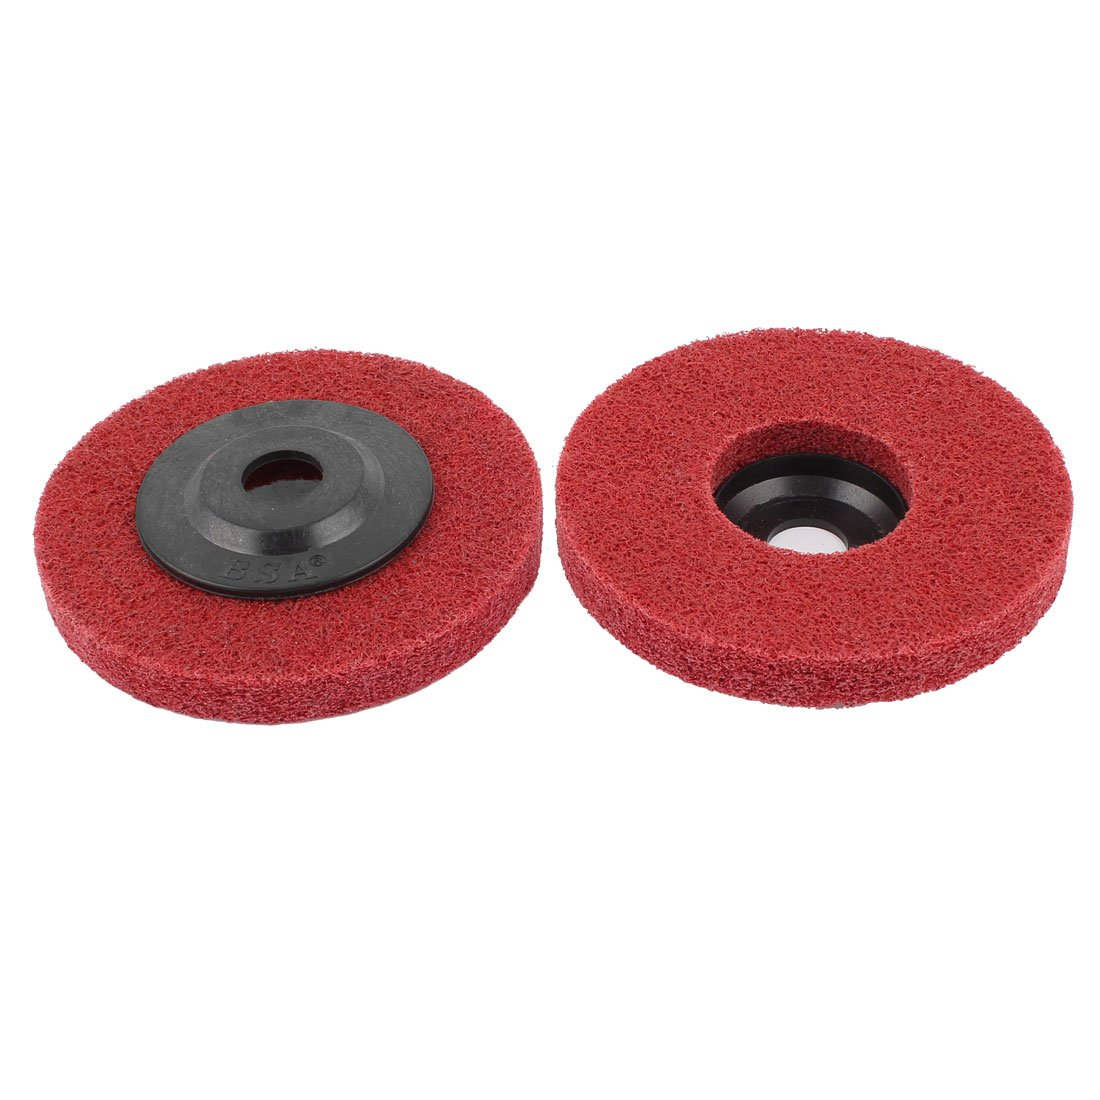 Sourcingmap 100mm x 13mm Red Nylon Abrasive Polishing Buffing Wheel 2 Pcs